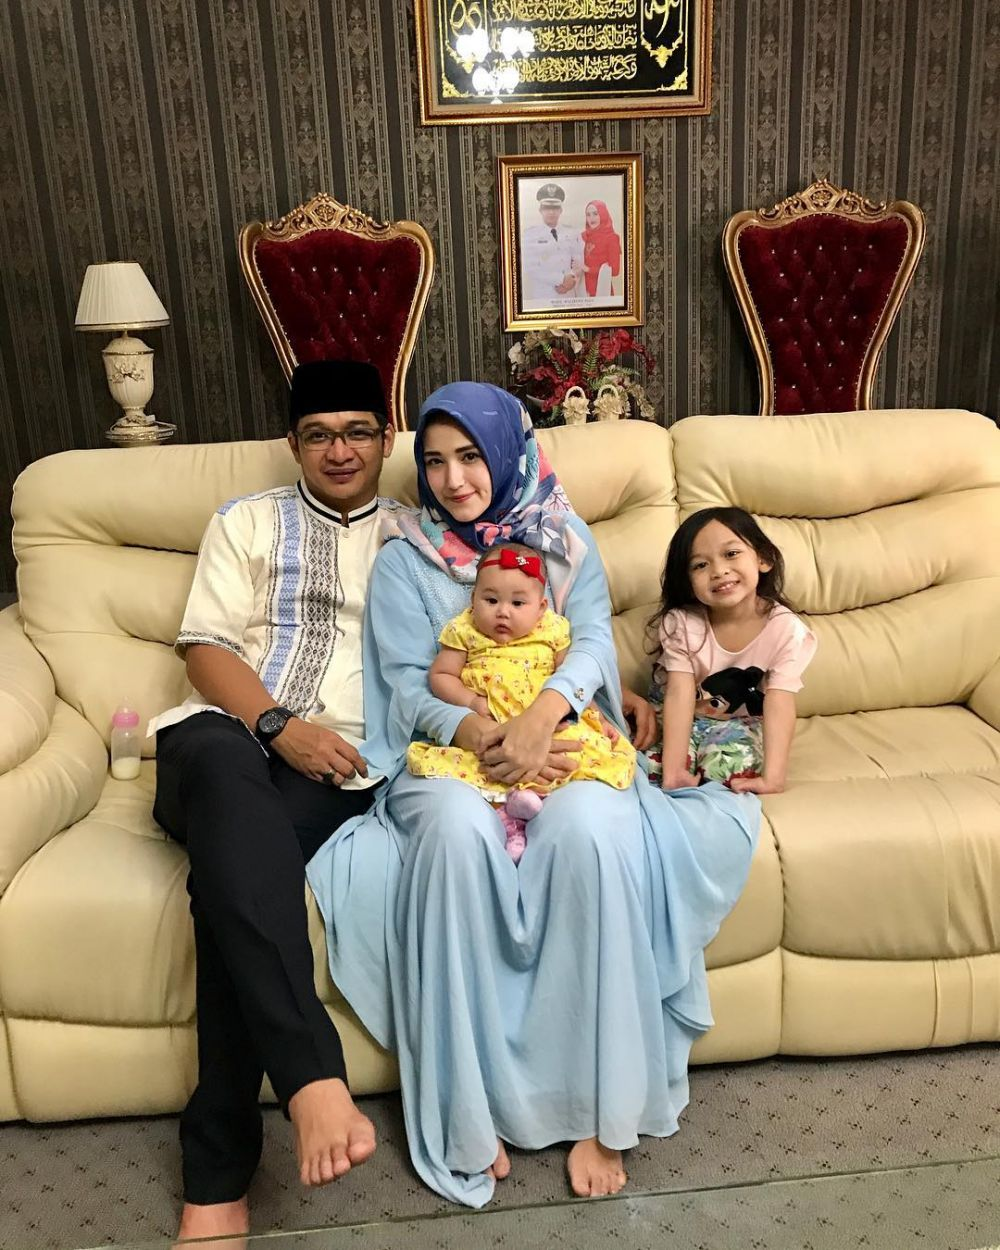 Gaya 10 Seleb Indonesia Rayakan Idul Adha, Kompak Pakai